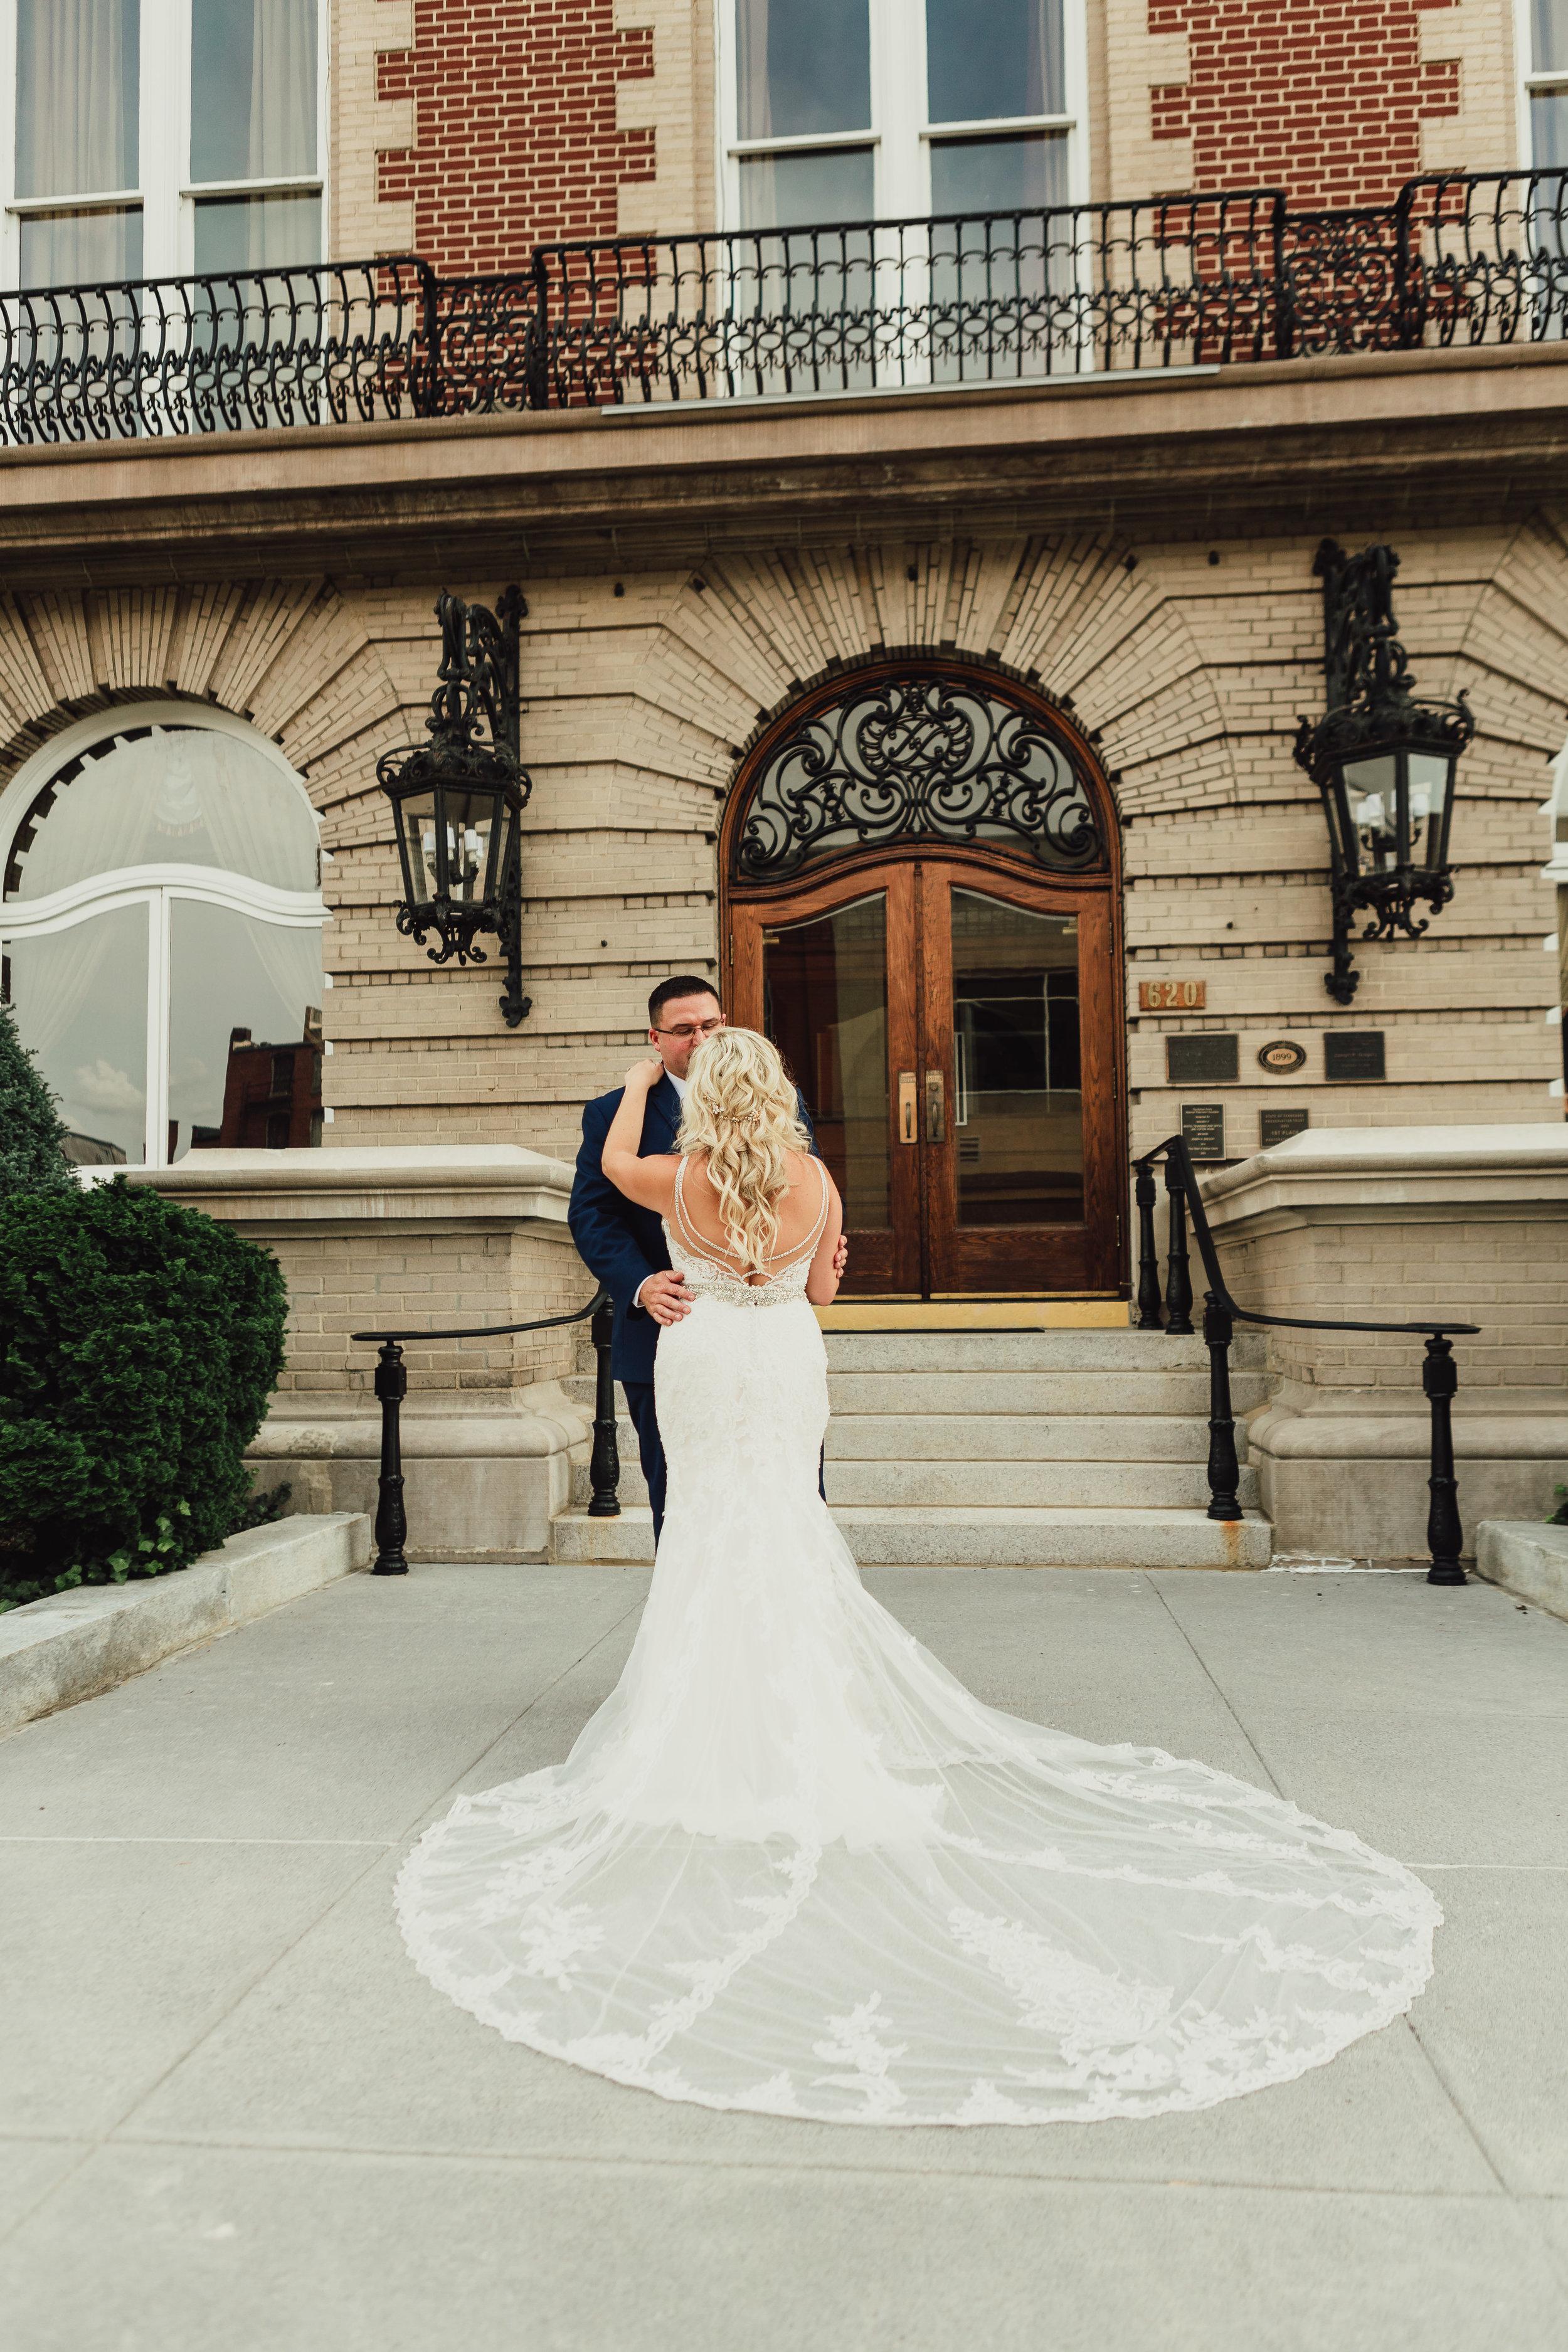 east-tn-wedding-photographer-tennessee-elopement-photographer-kingsport-tn-wedding-photographer (428 of 1001).jpg